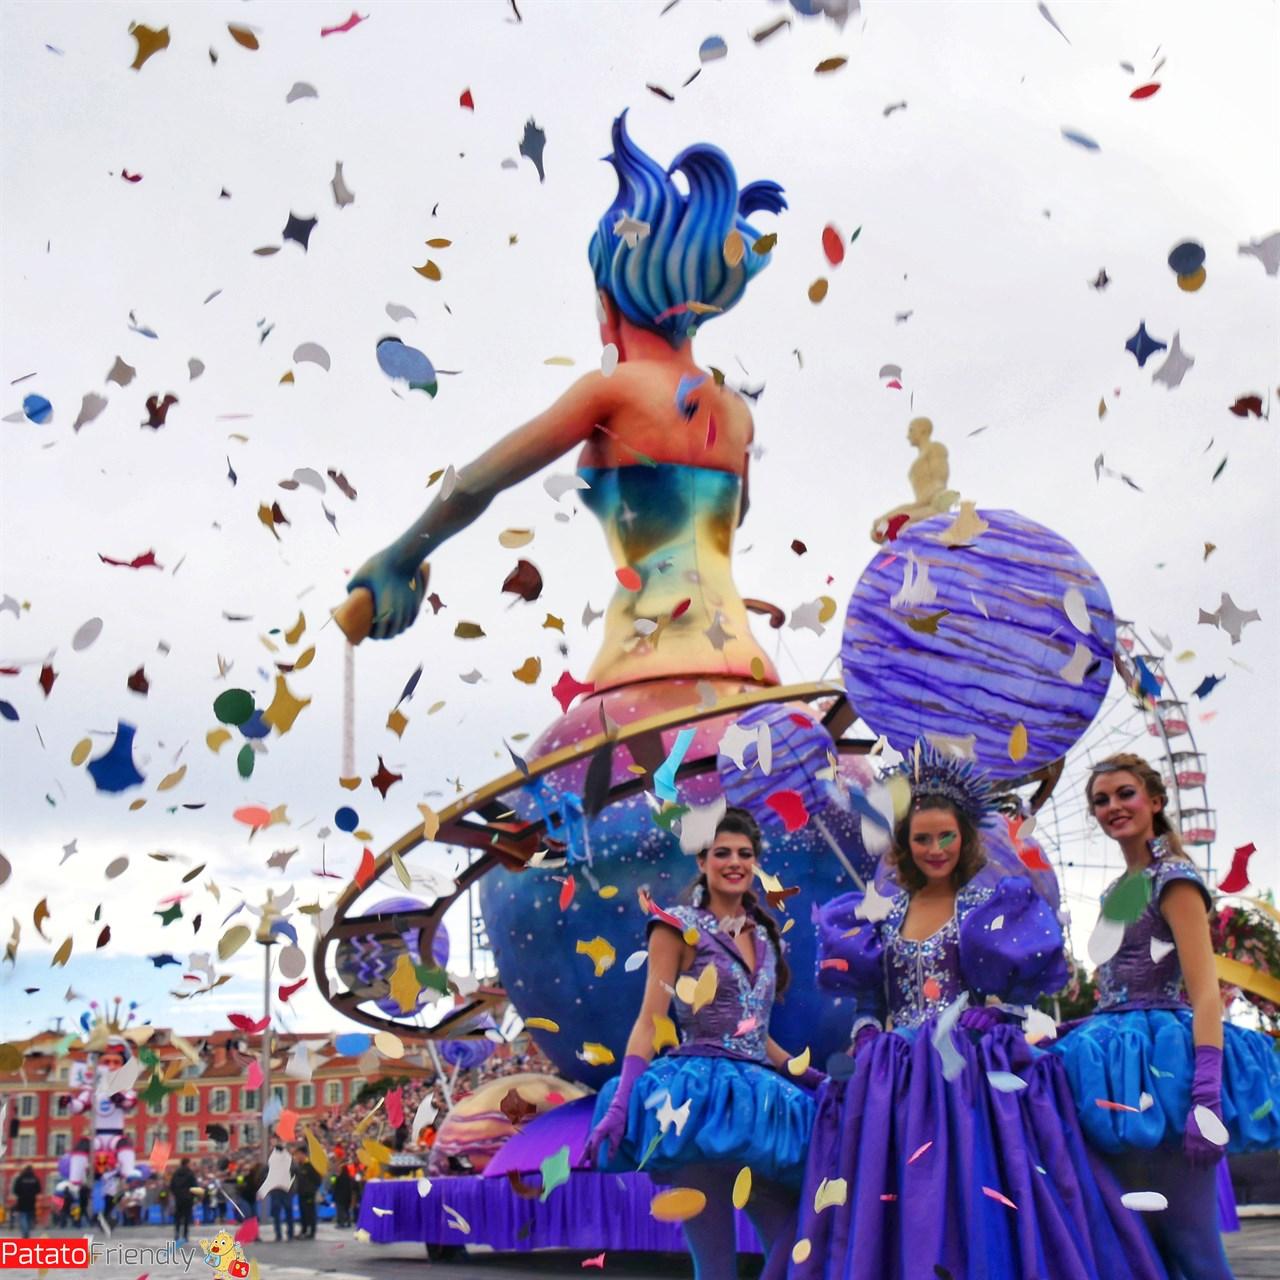 [cml_media_alt id='13582']Il Carnevale dei fiori di Nizza[/cml_media_alt]